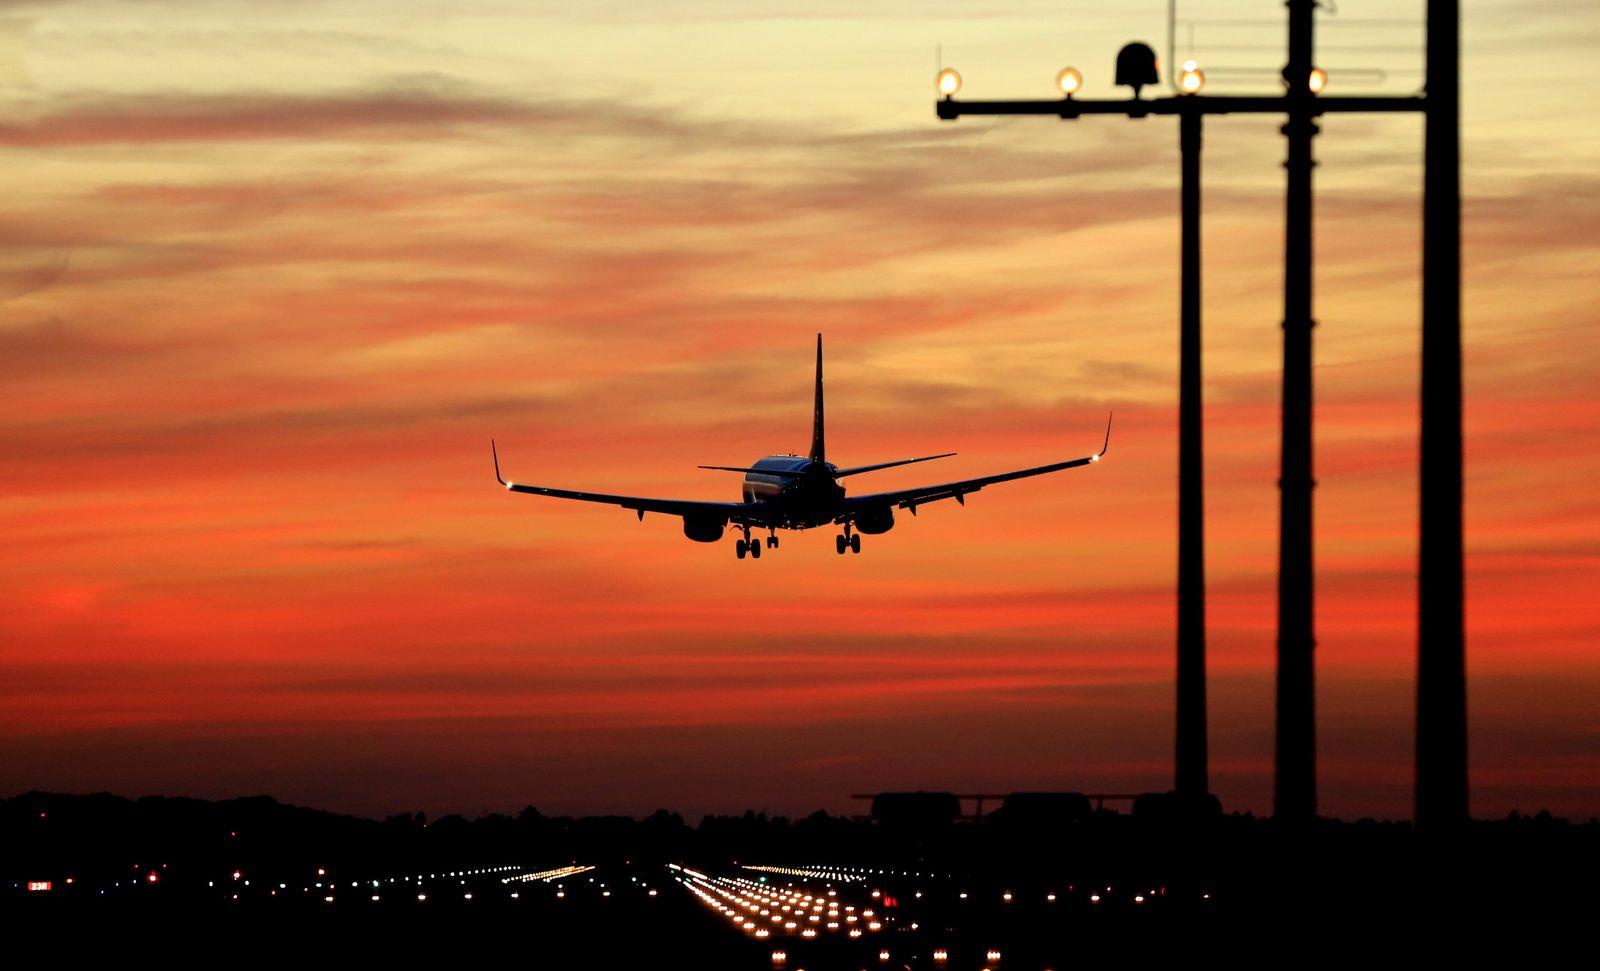 Sonnenuntergang am Düsseldorfer Flughafen